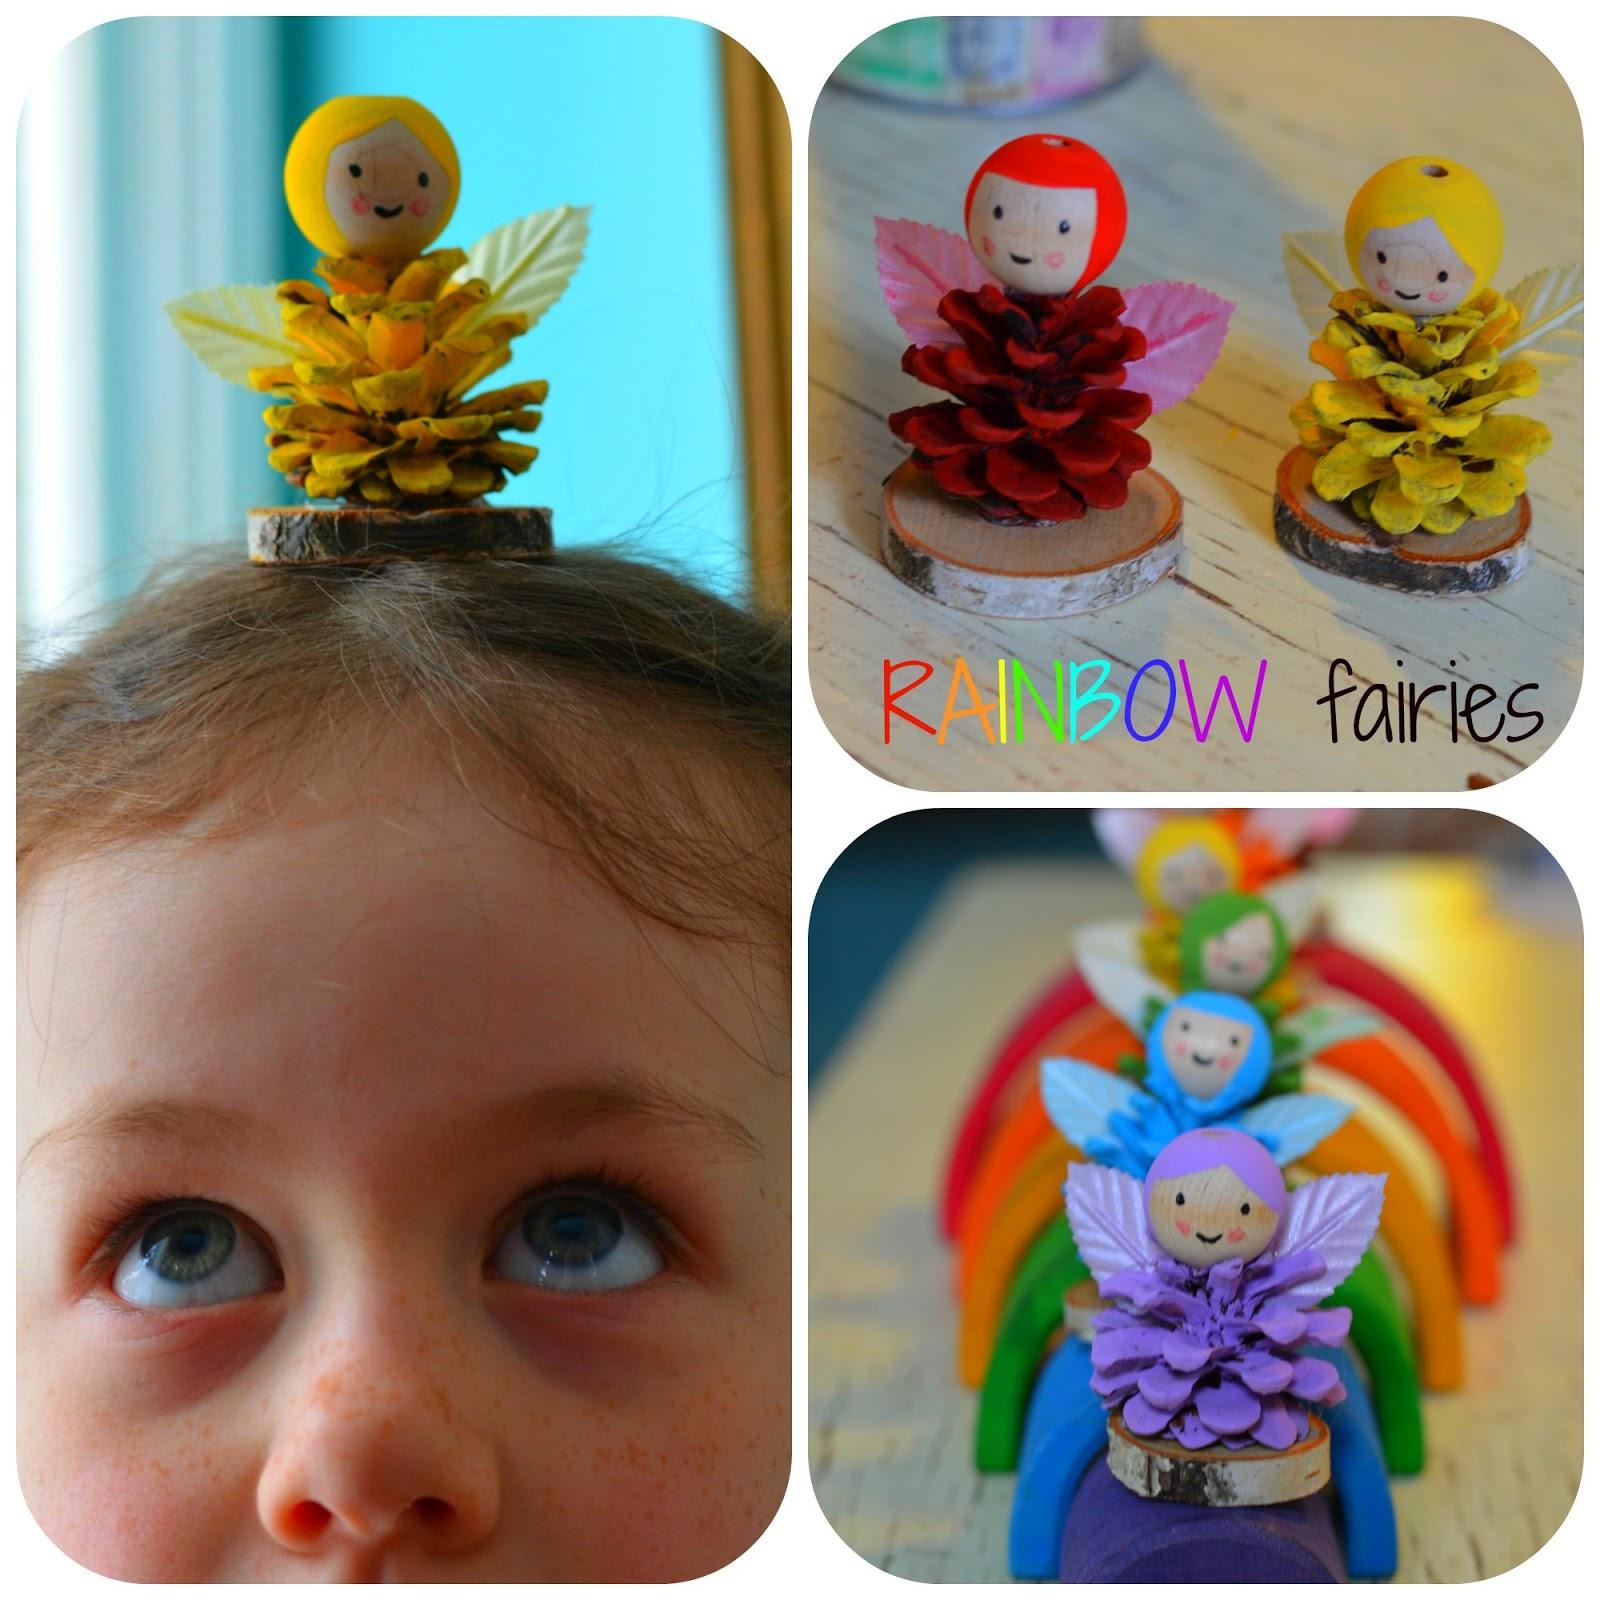 http://twigandtoadstool.blogspot.ca/2014/03/rainbow-fairies.html